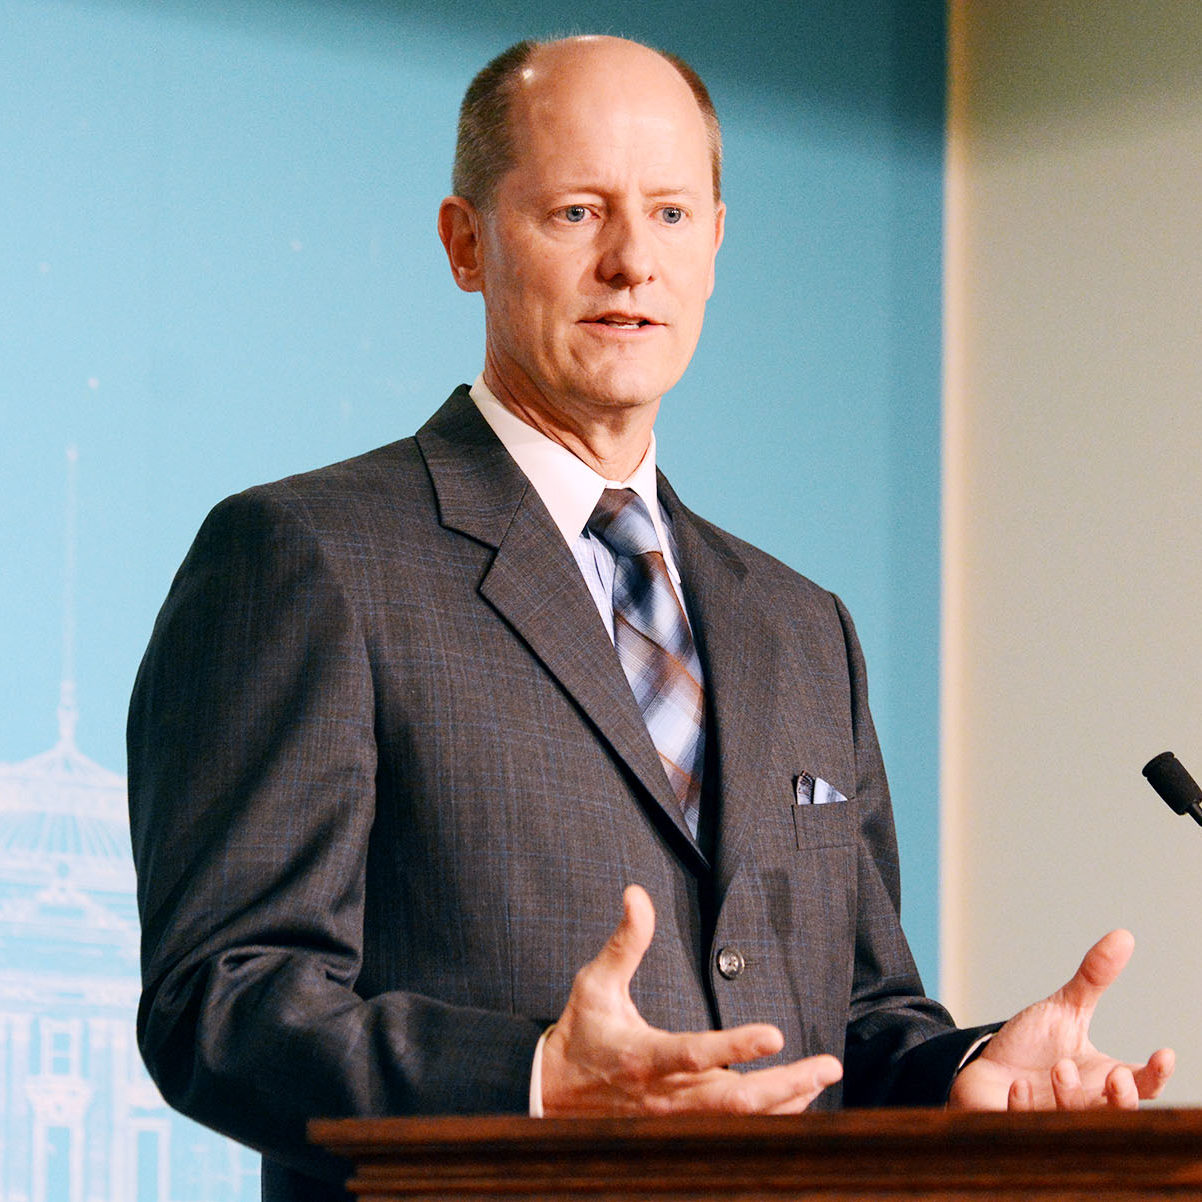 Commentary: Leader Gazelka & Speaker Daudt on the governor's defunding of the Minnesota Legislature